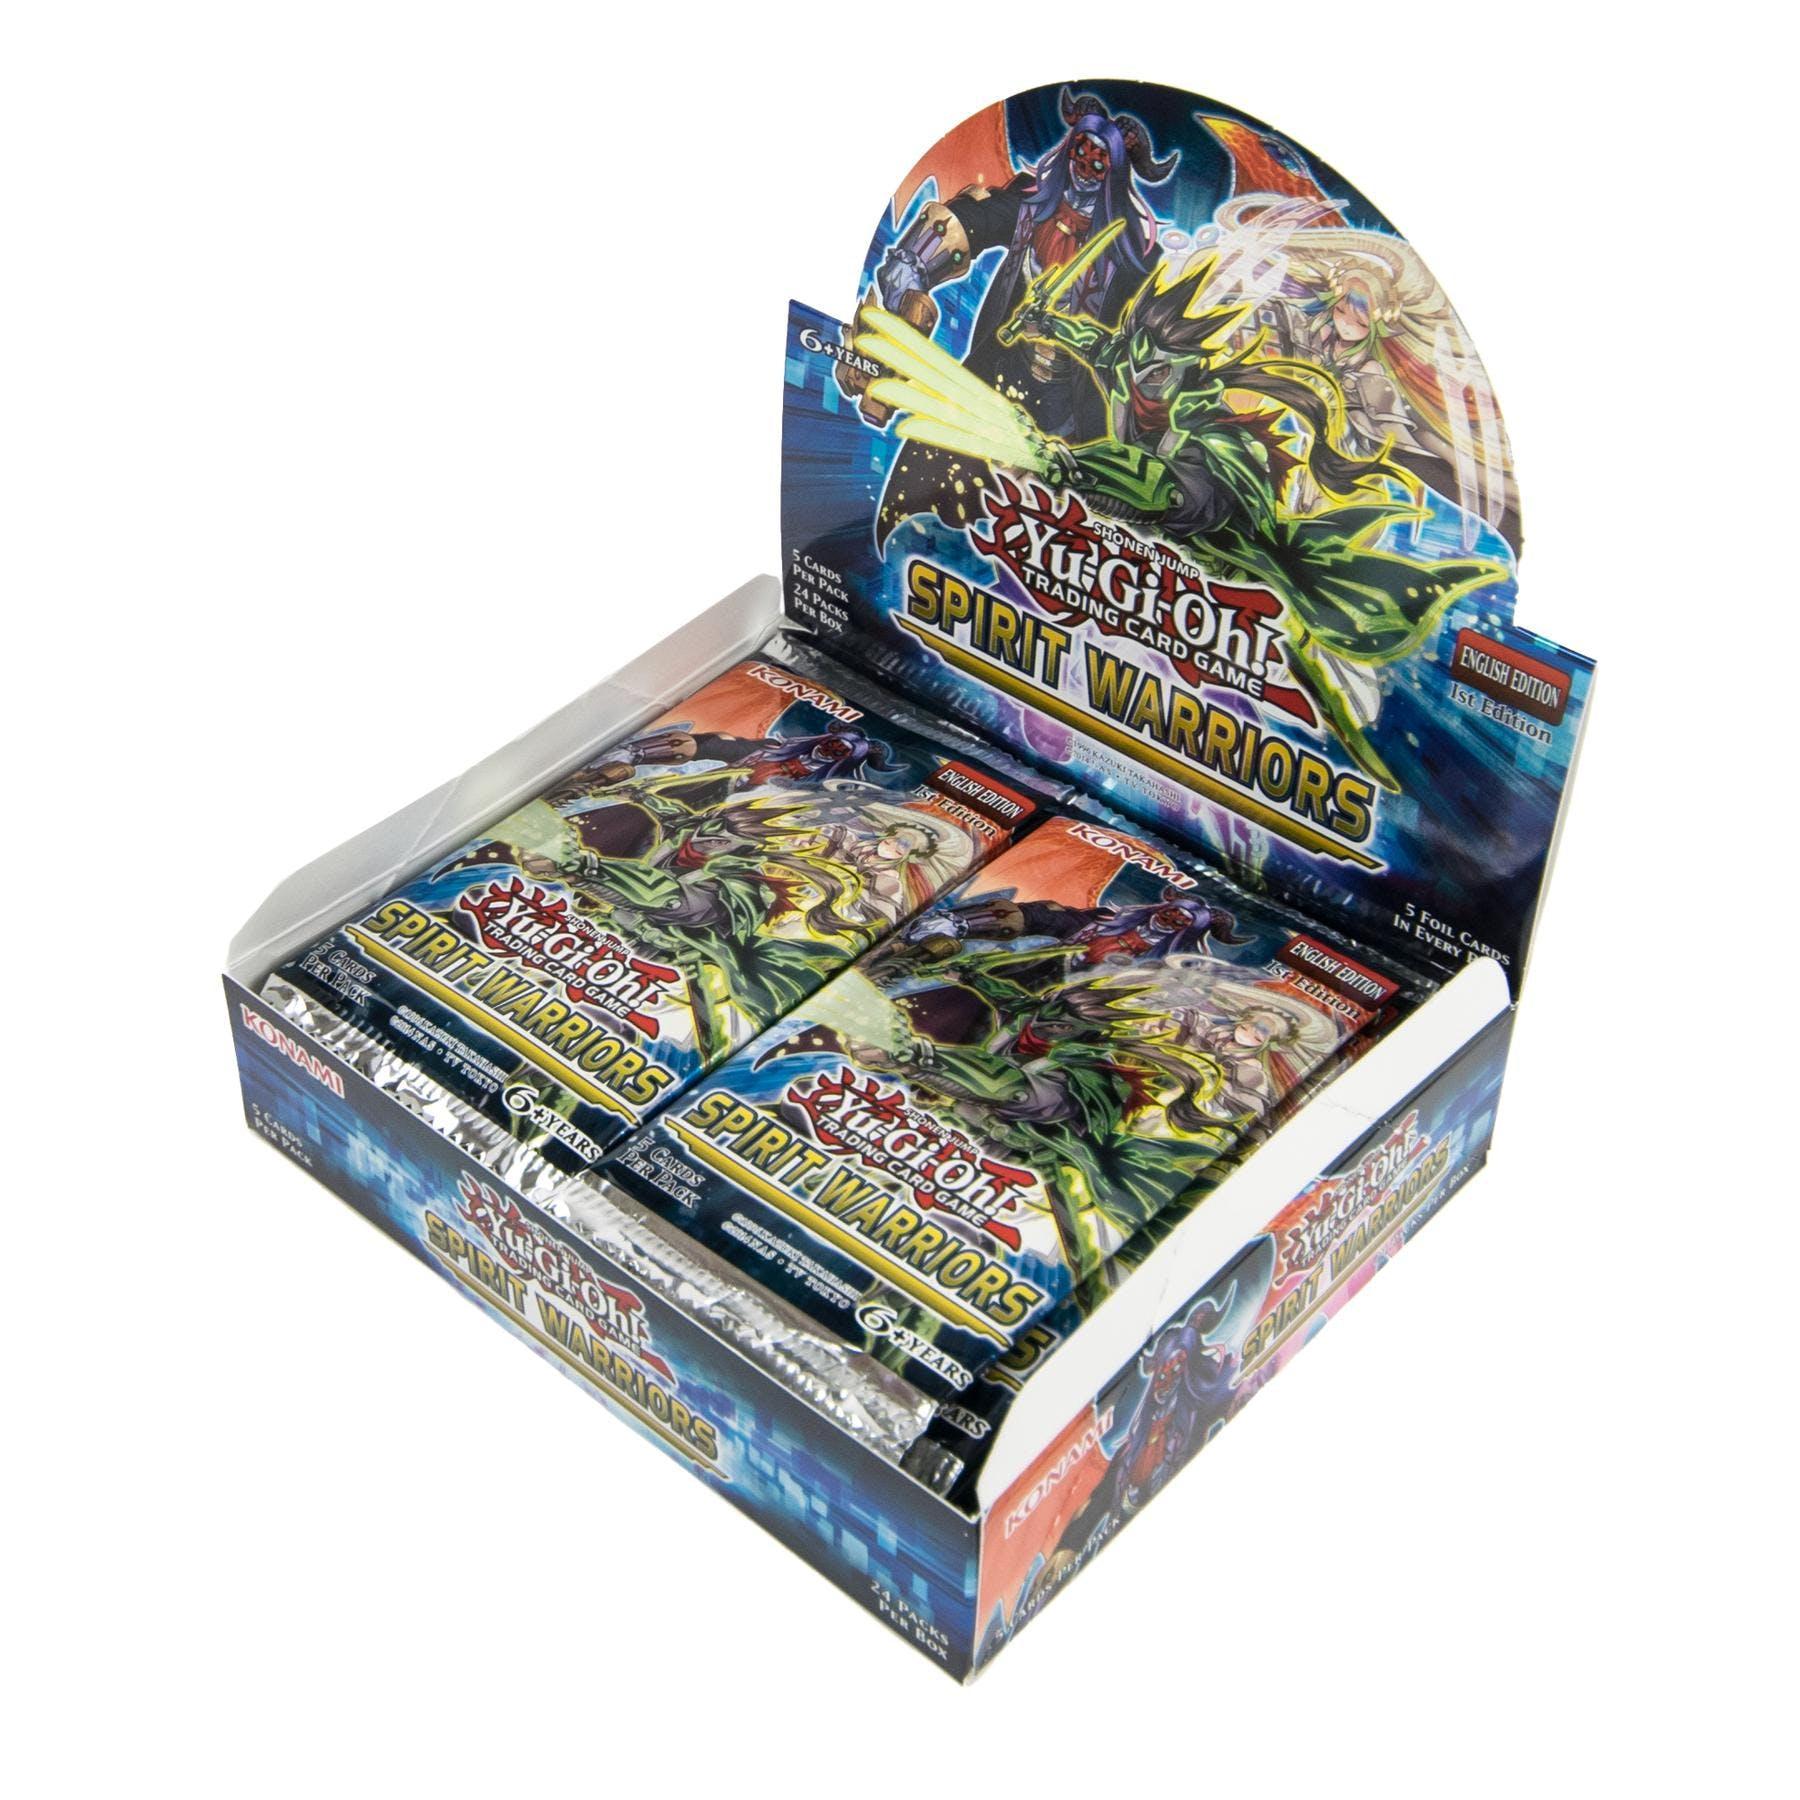 Yu-Gi-Oh Spirit Warriors 1st Edition Booster Box